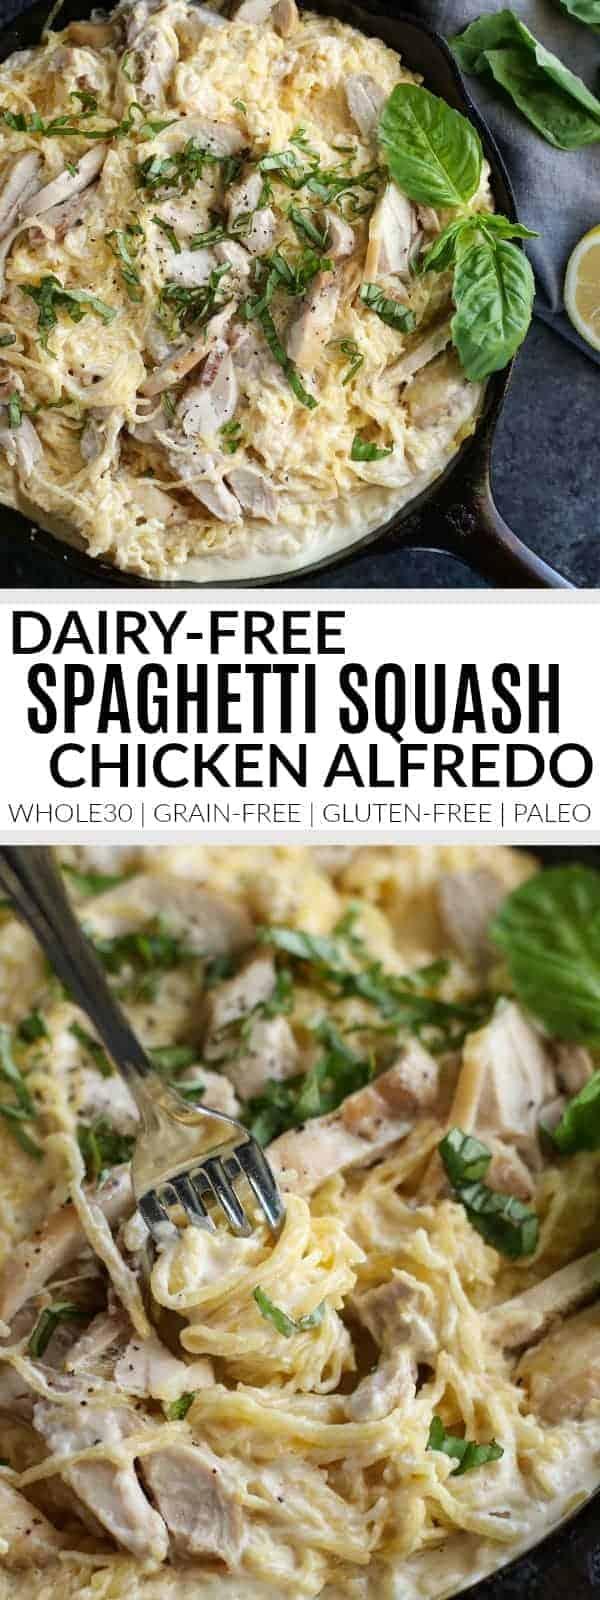 pinterest image for Dairy-Free Spaghetti Squash Chicken Alfredo